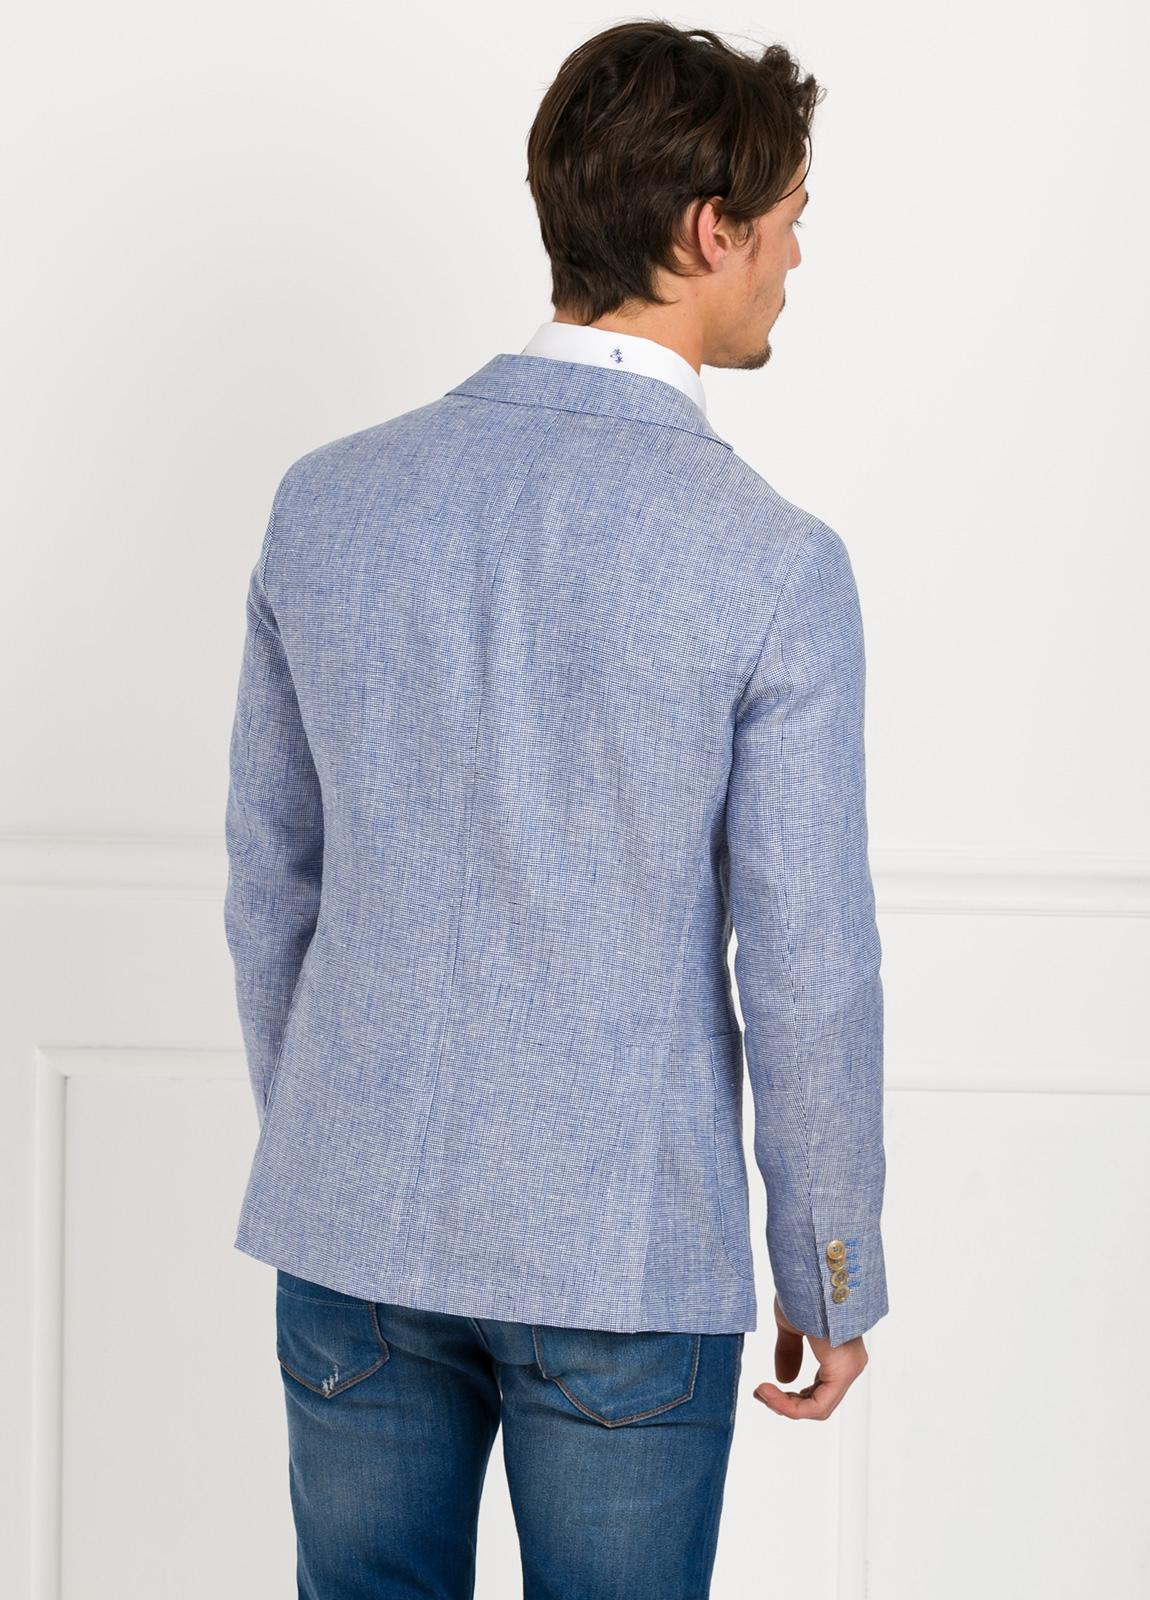 Americana SOFT JACKET Slim Fit diseño textura color azul. 60% Lino 18% Lana 12% Seda 10% Algodón. - Ítem1